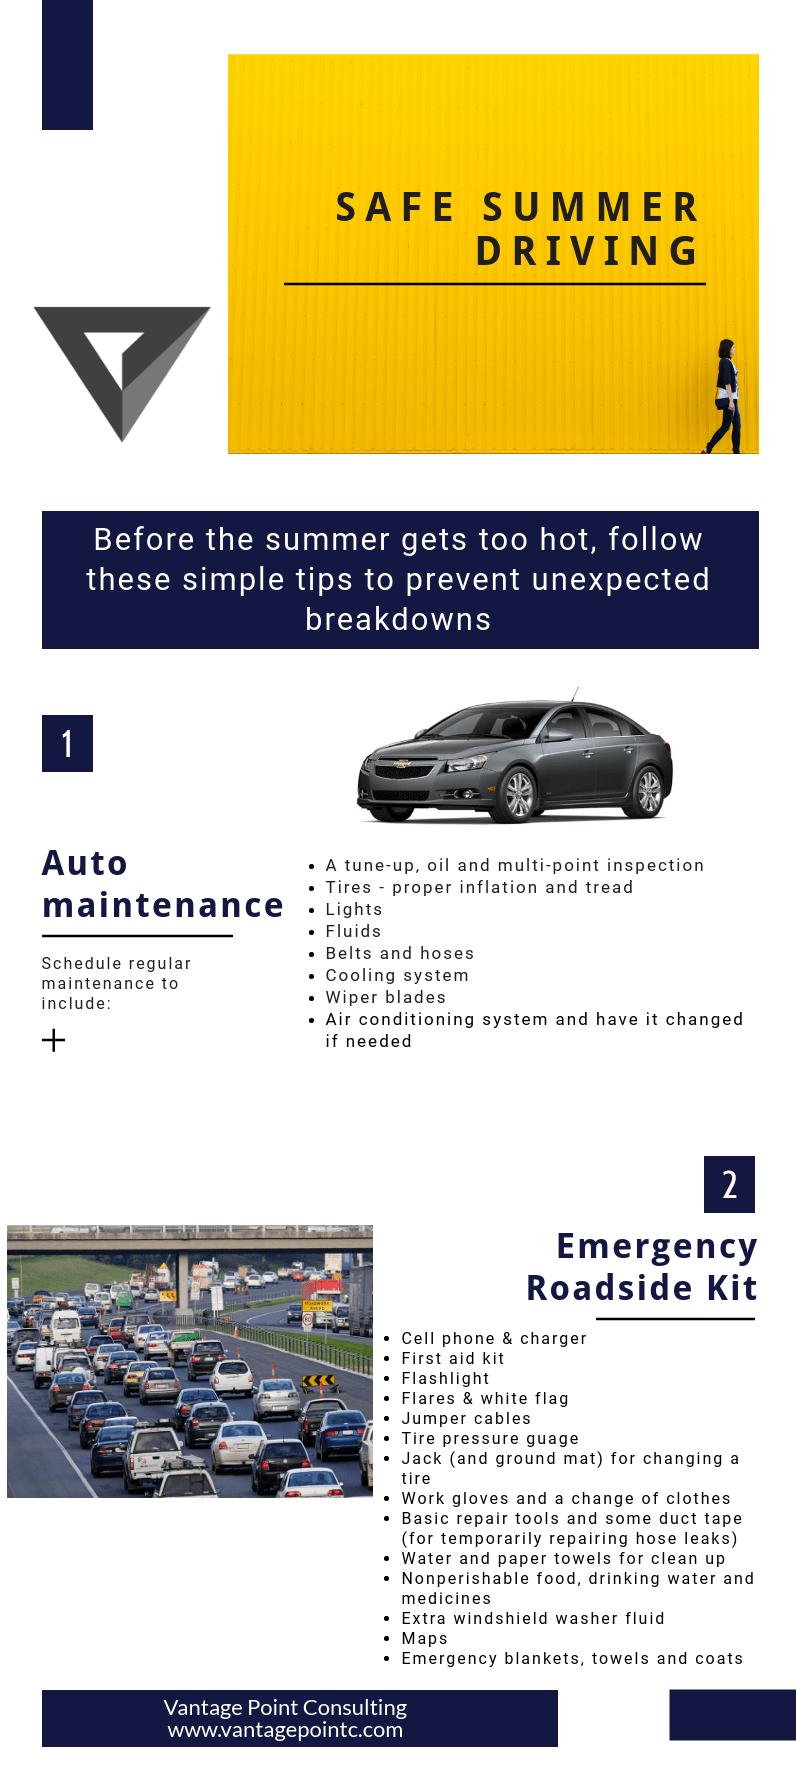 Safe Summer Driving